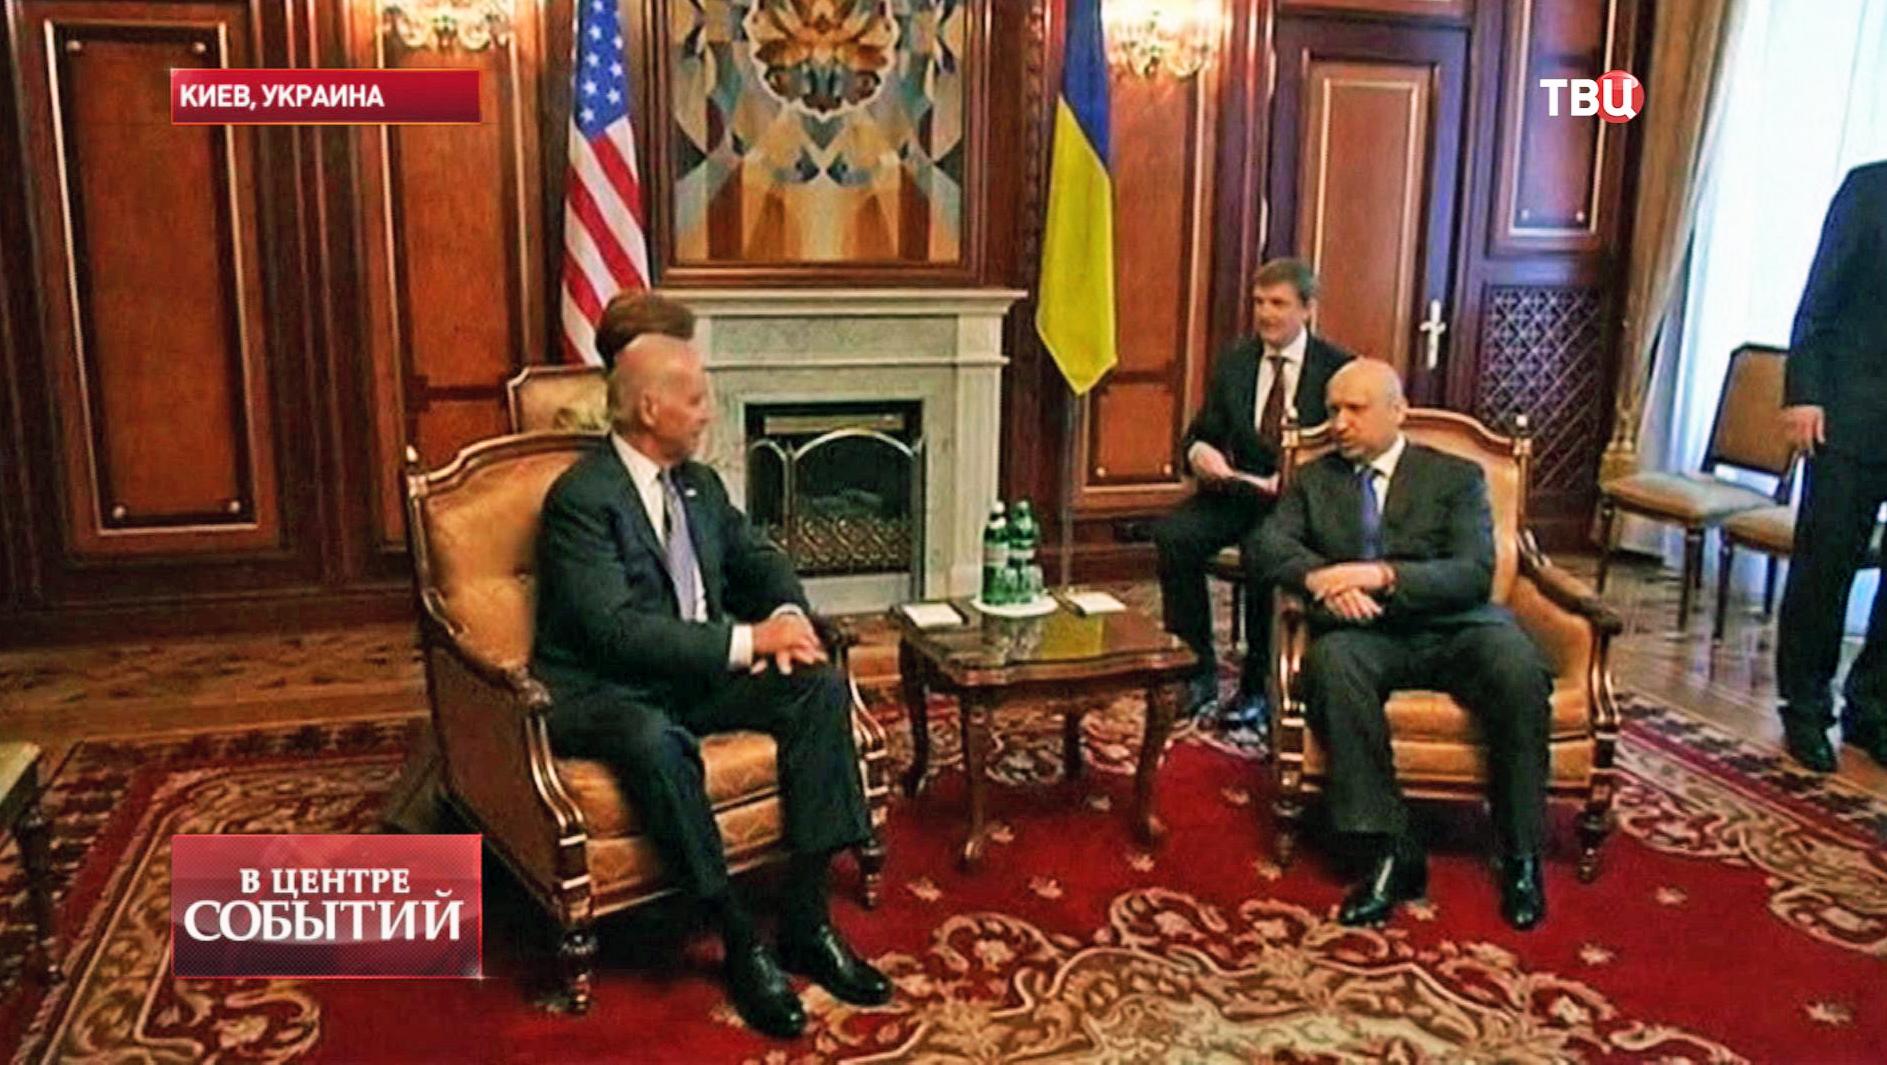 Вице-президент США Джо Байден и исполняющий обязанности президента Украины Александр Турчинов